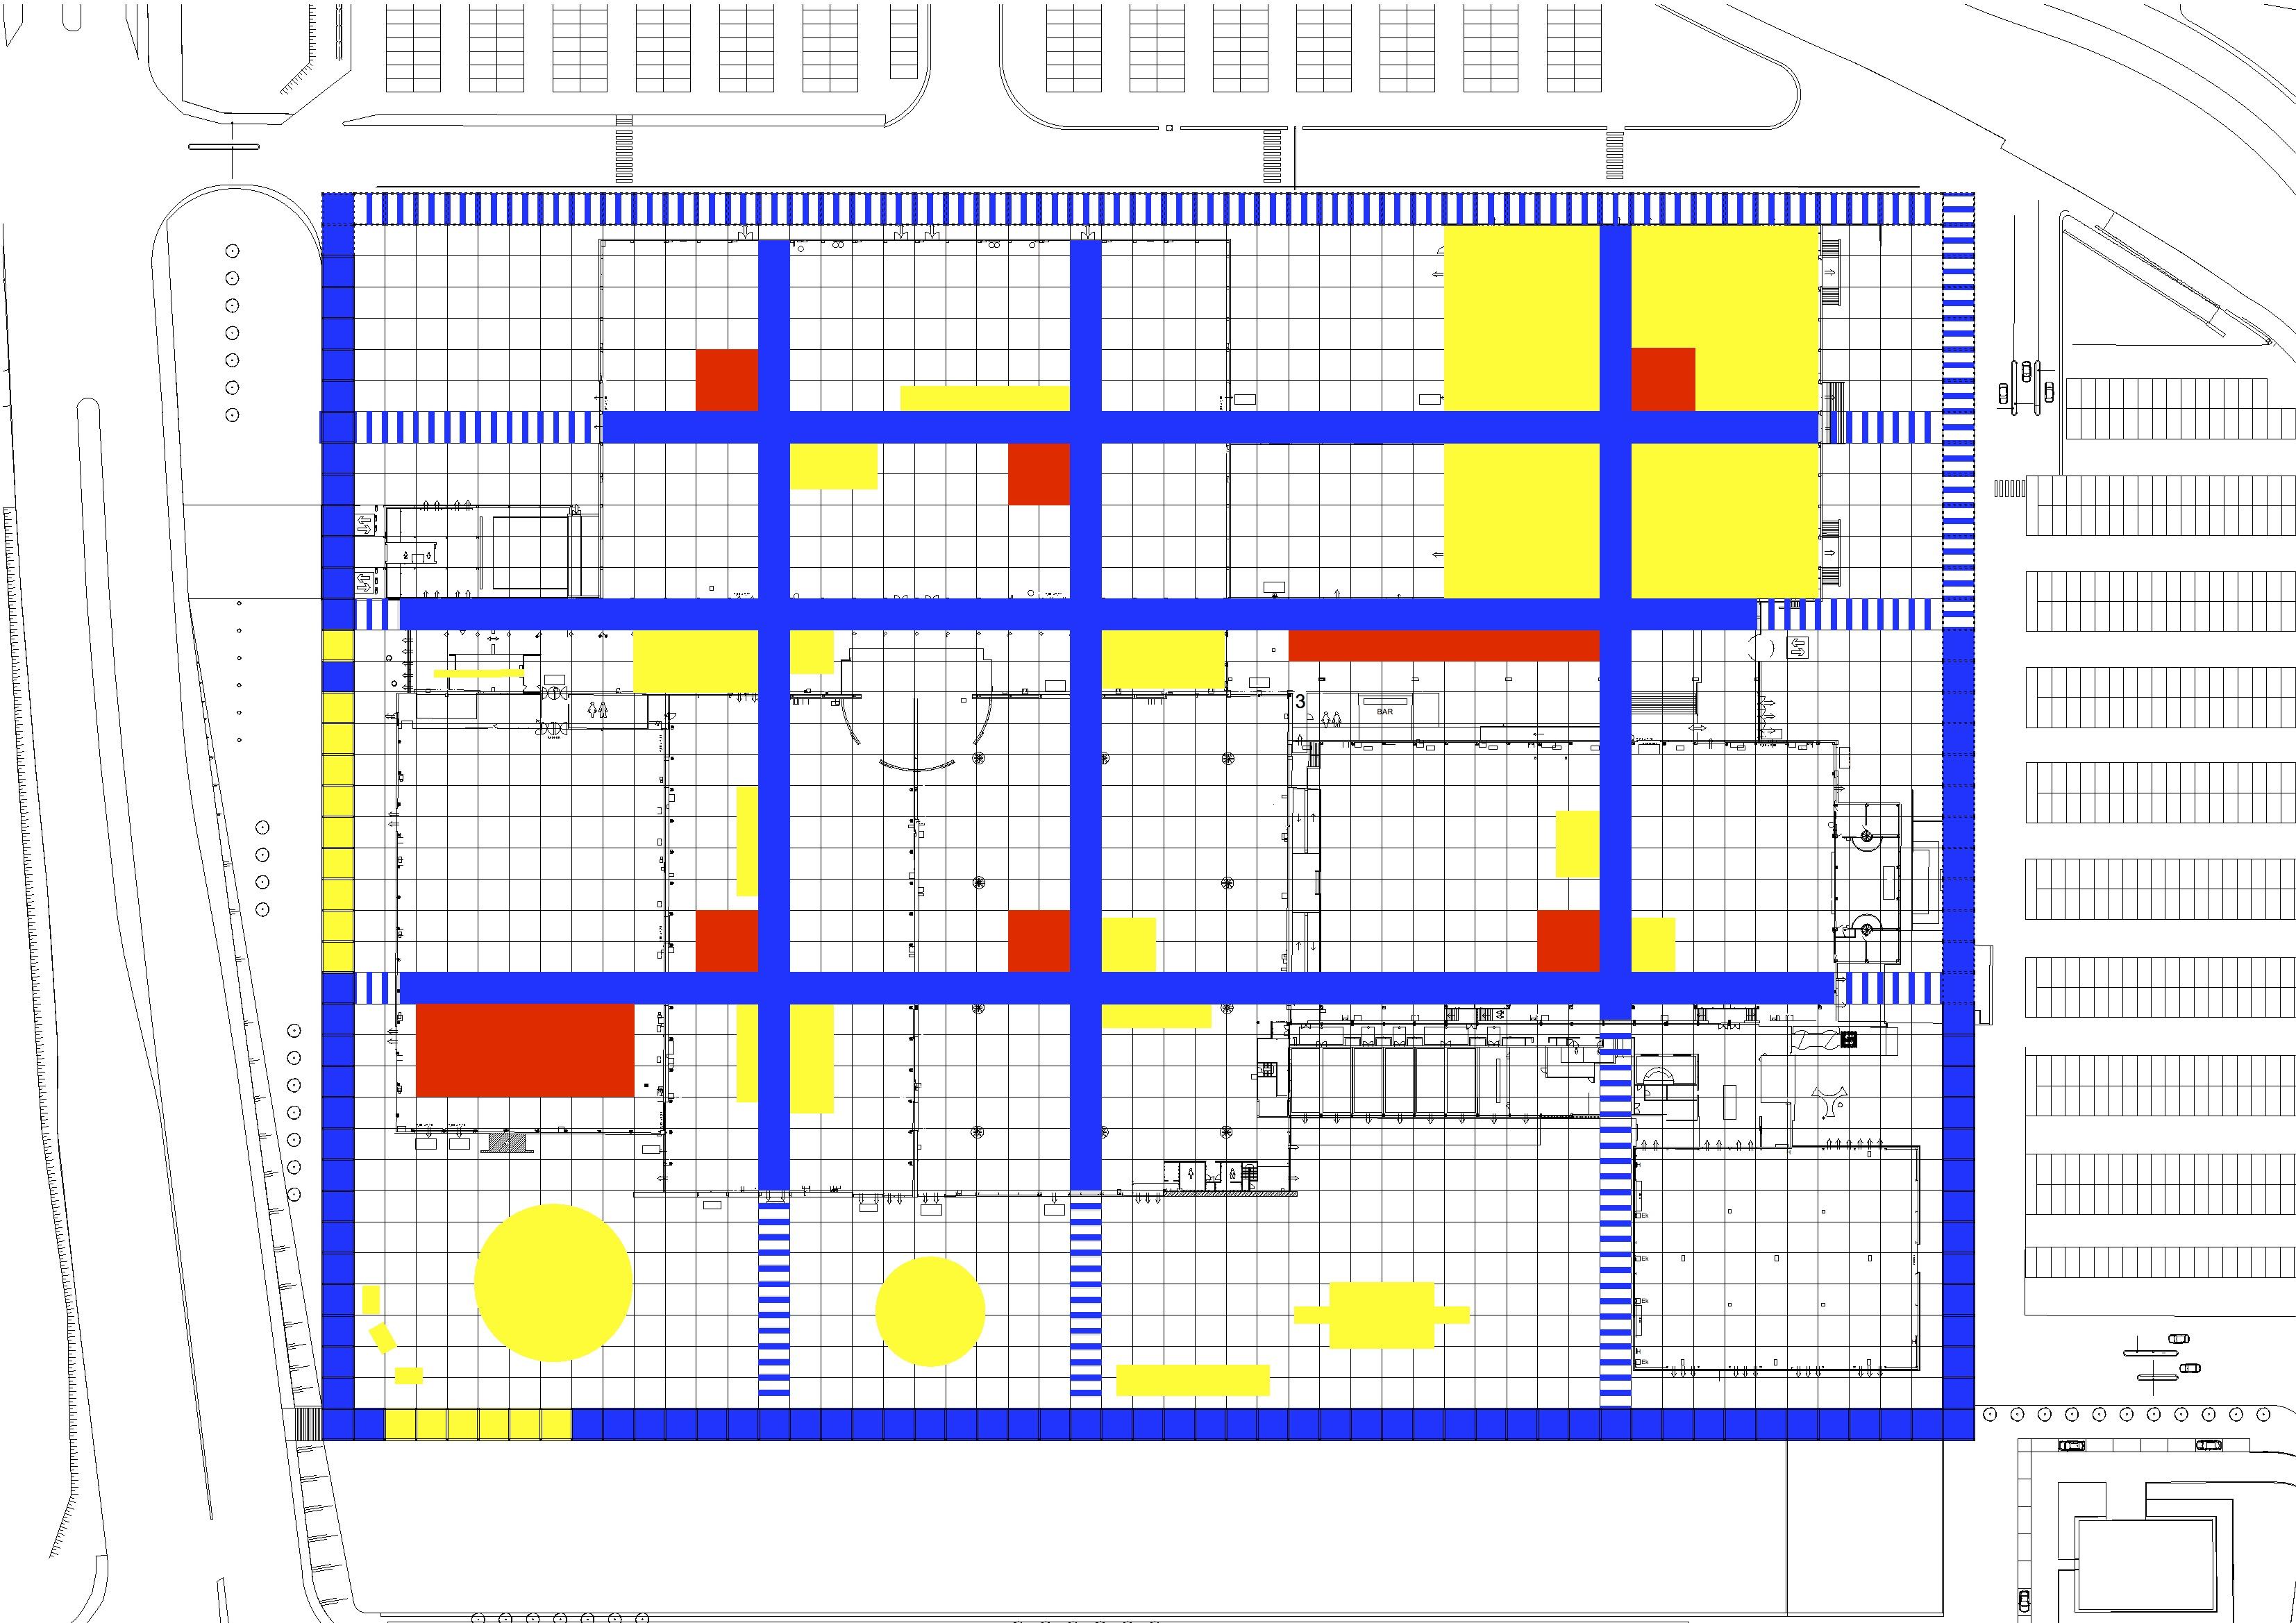 Blog – Biënnale Kortrijk zet interieur centraal - De Architect